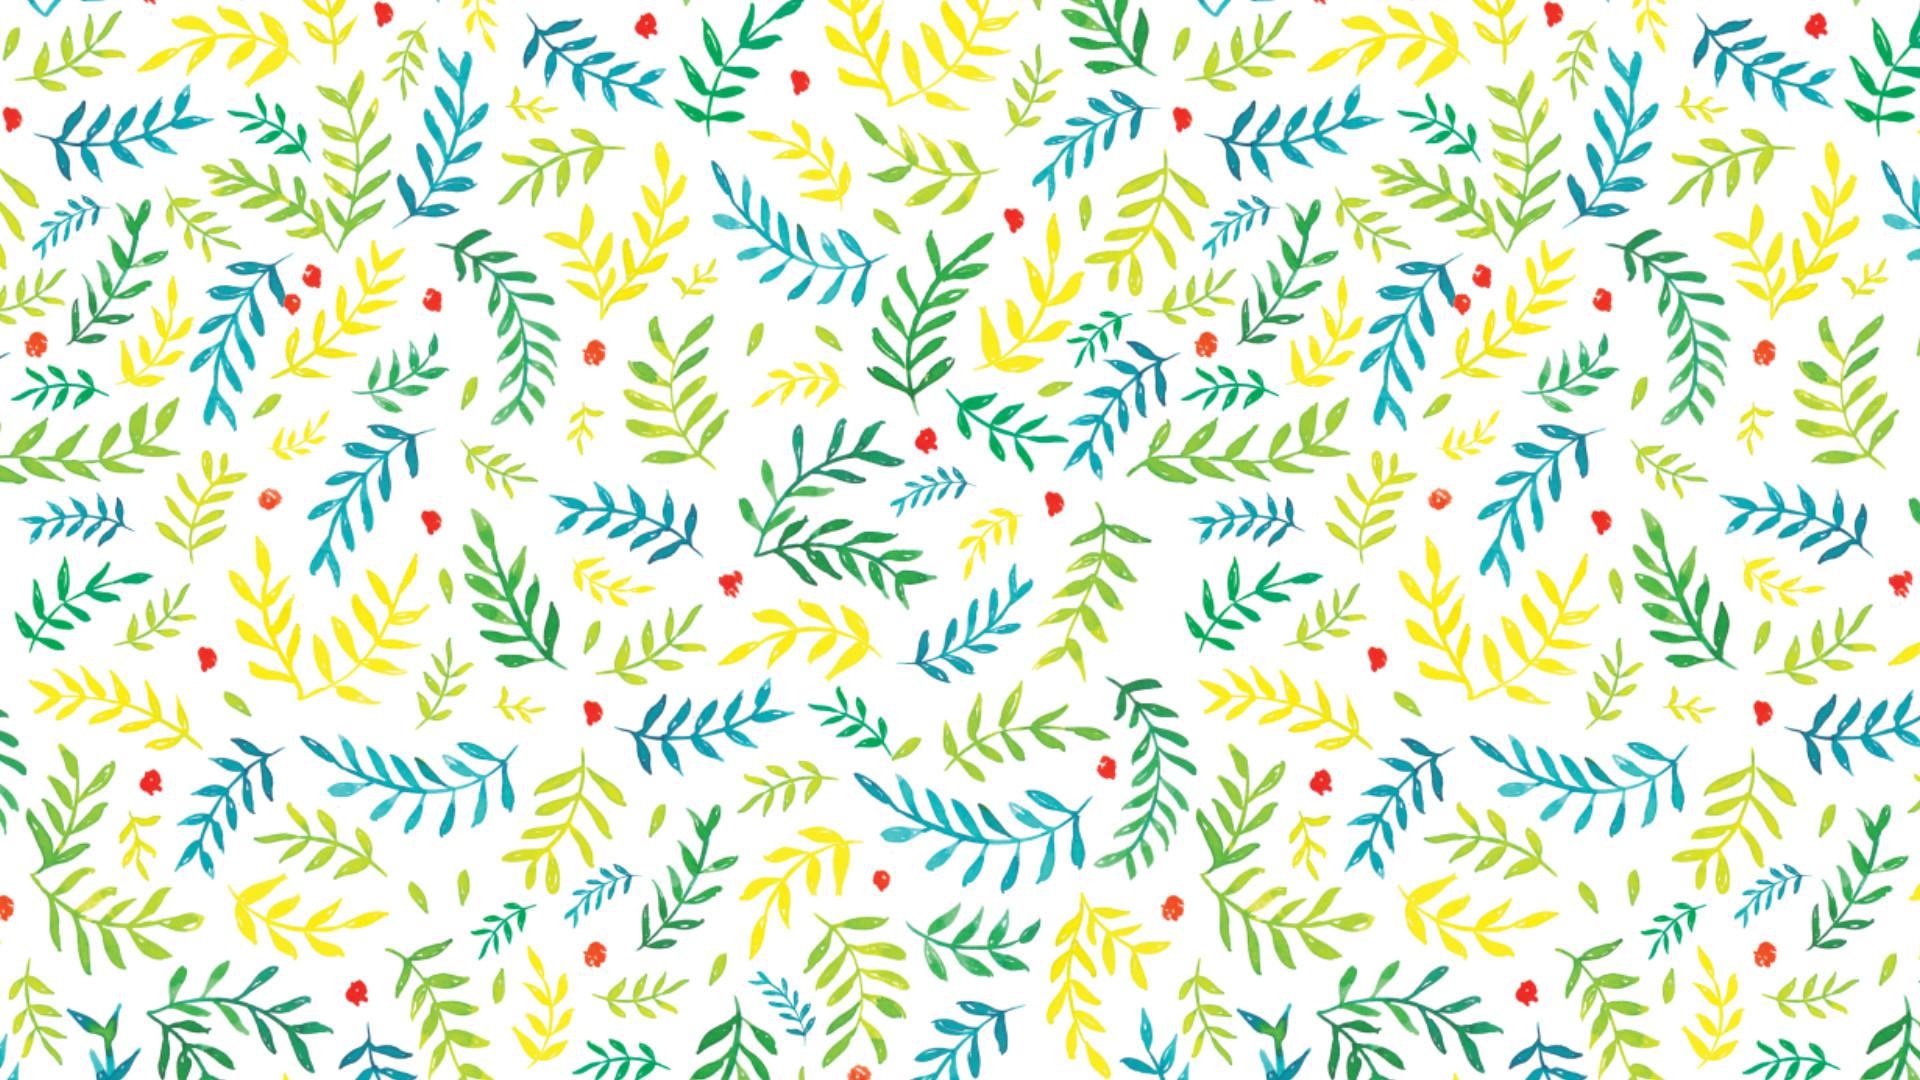 Fall Leaves Wallpaper Macbook Desktop Wallpaper Patterns 183 ①